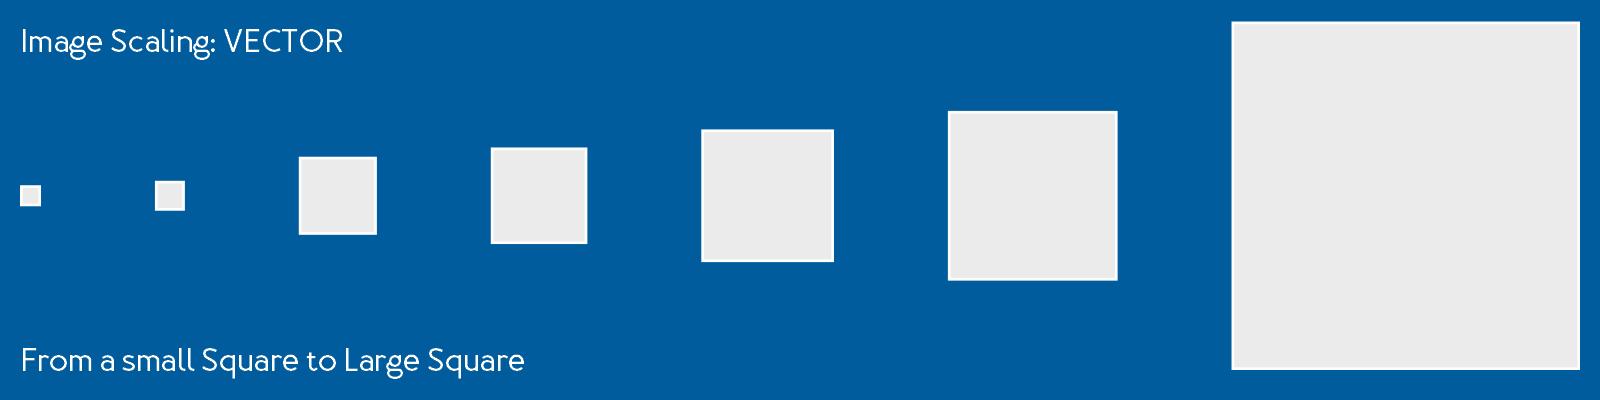 Image File Formats Vector based images